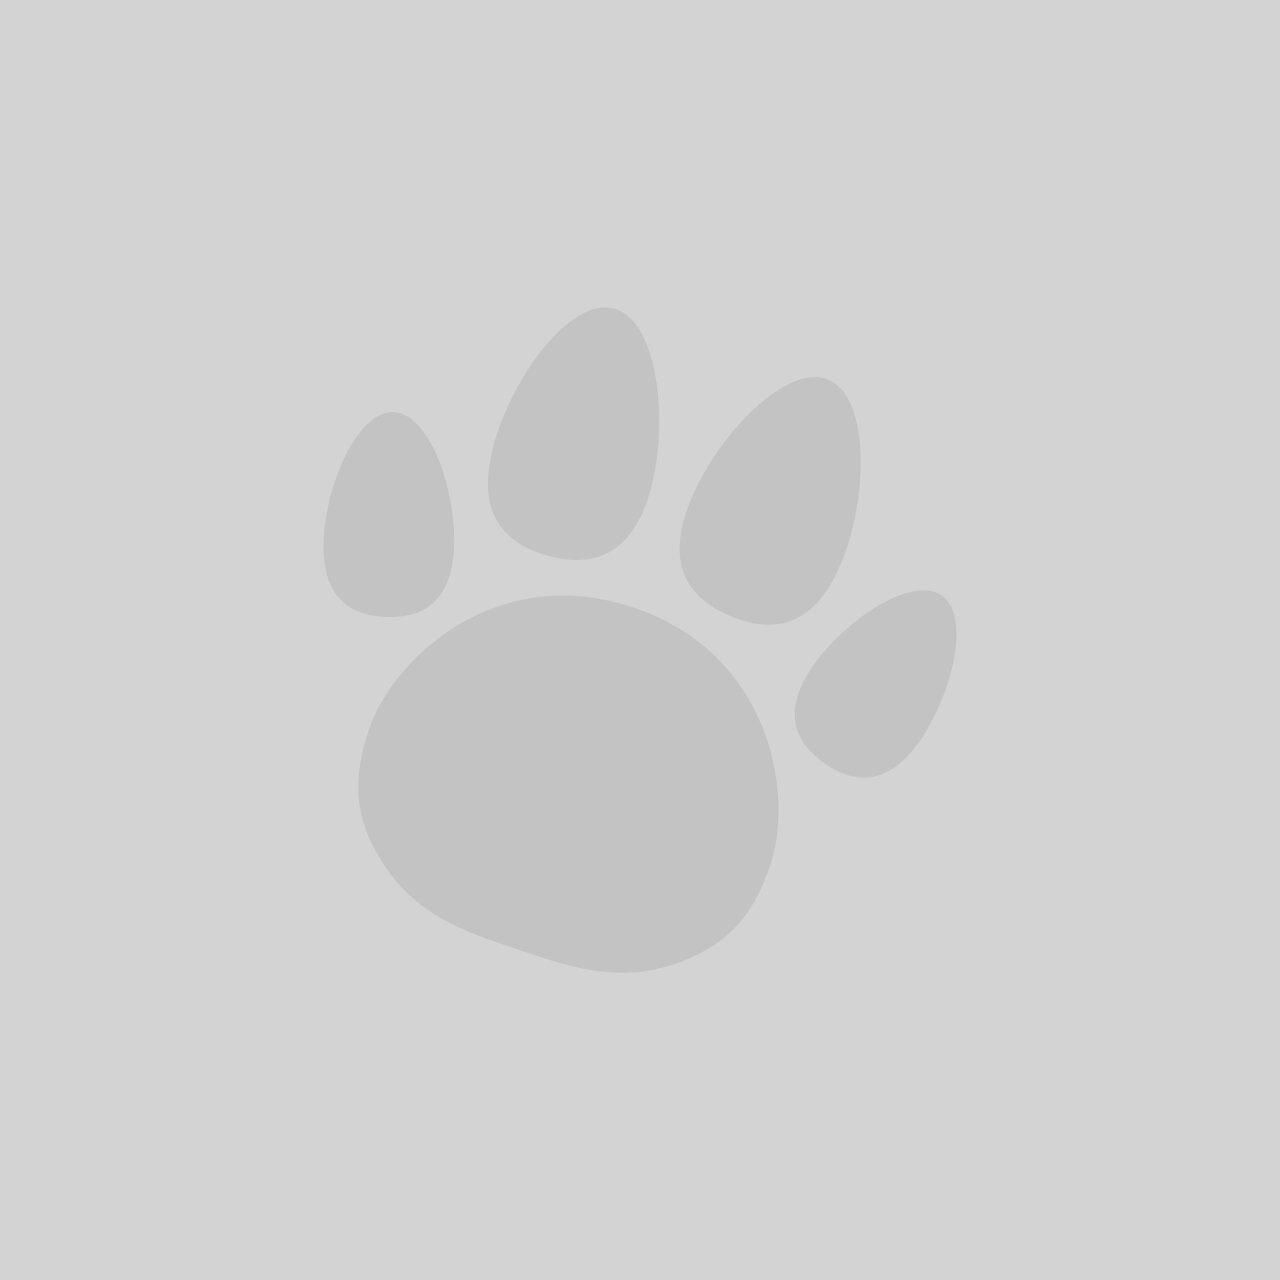 Flexi Classic Retractable Cord Small Dog Lead 8m - Red